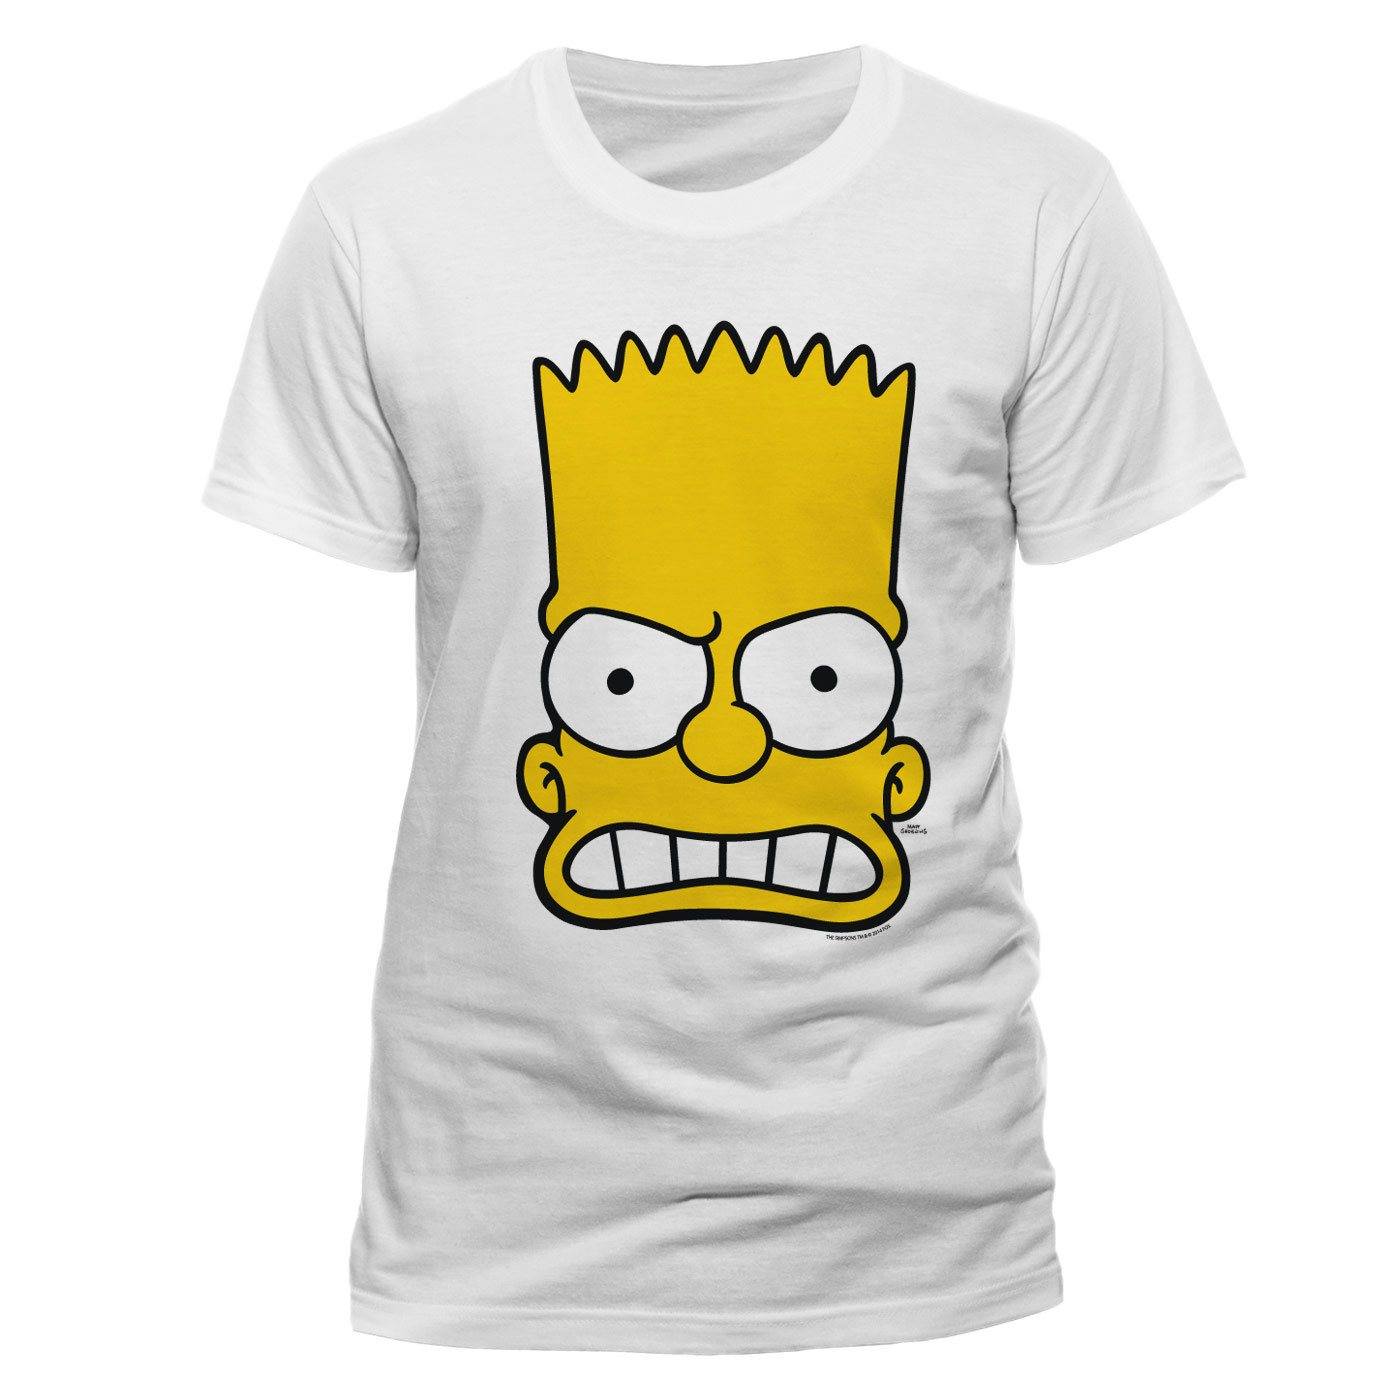 Simpsons T-Shirt Bart Face Size XL